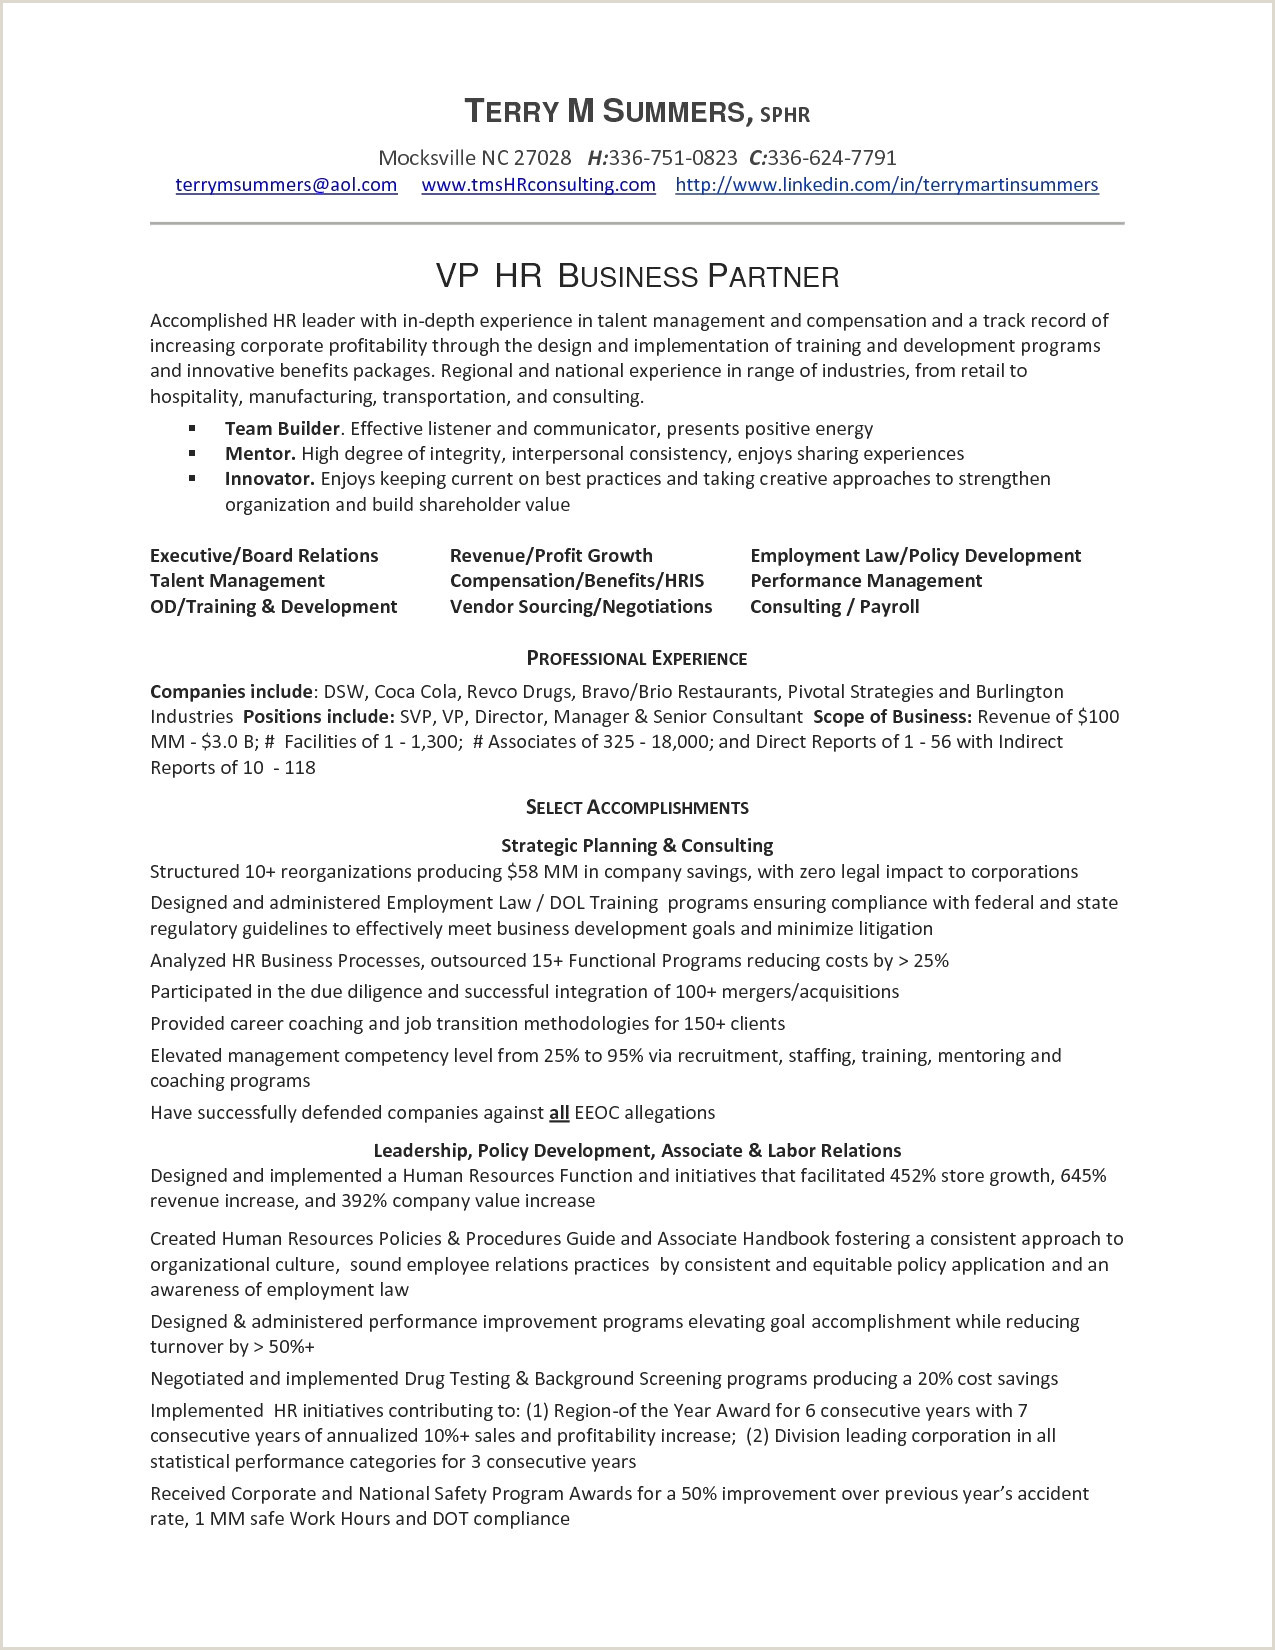 Cv Examples for Job Sri Lanka Government Cover Letter Examples Canada Fresh Fresh Sample